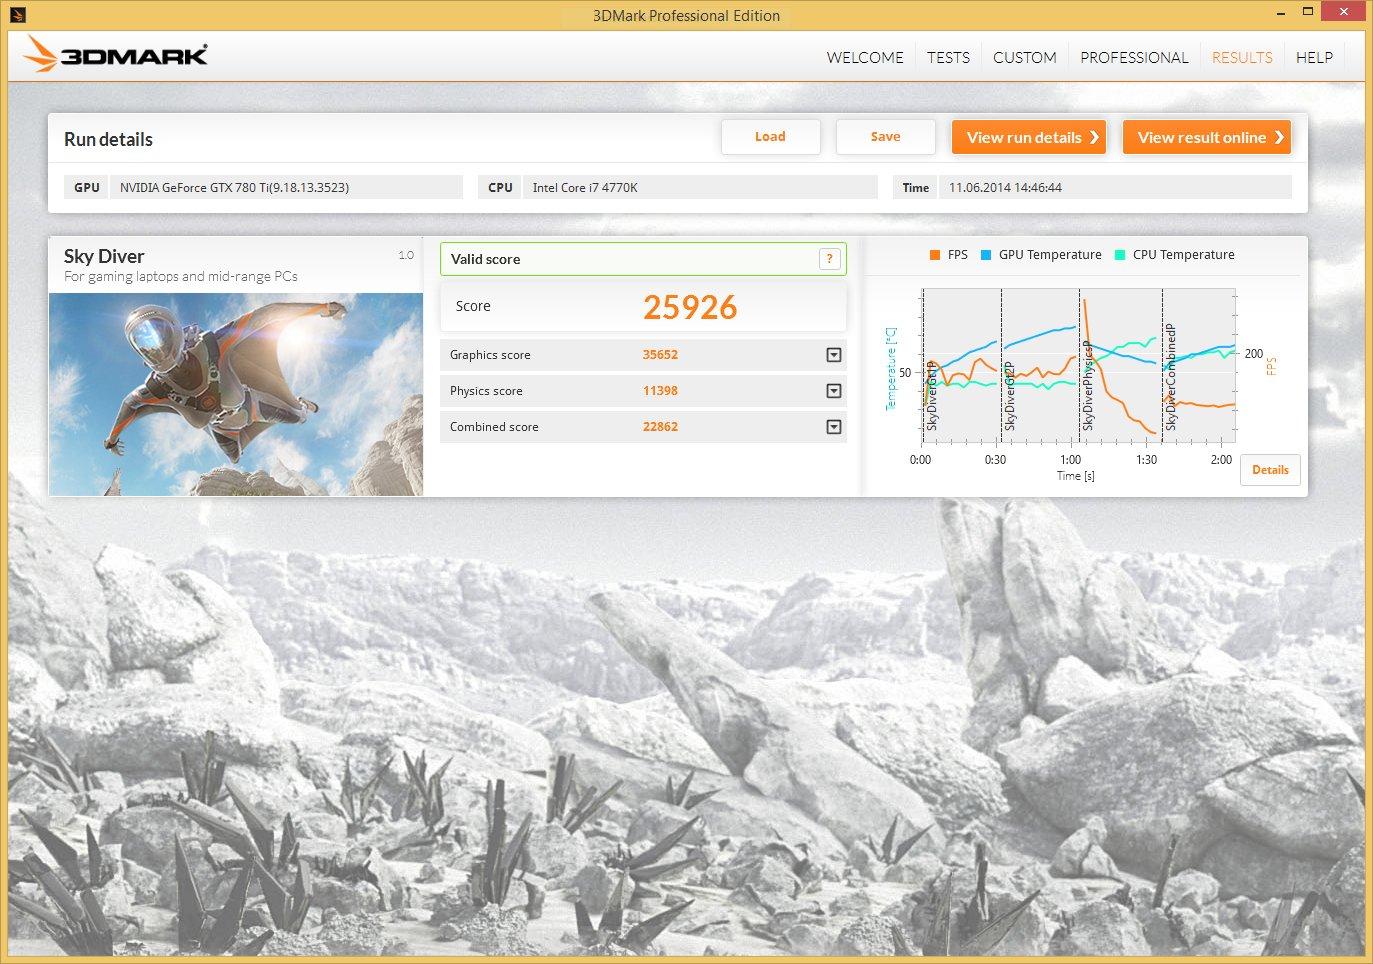 Sky Diver – Nvidia GeForce GTX 780 Ti